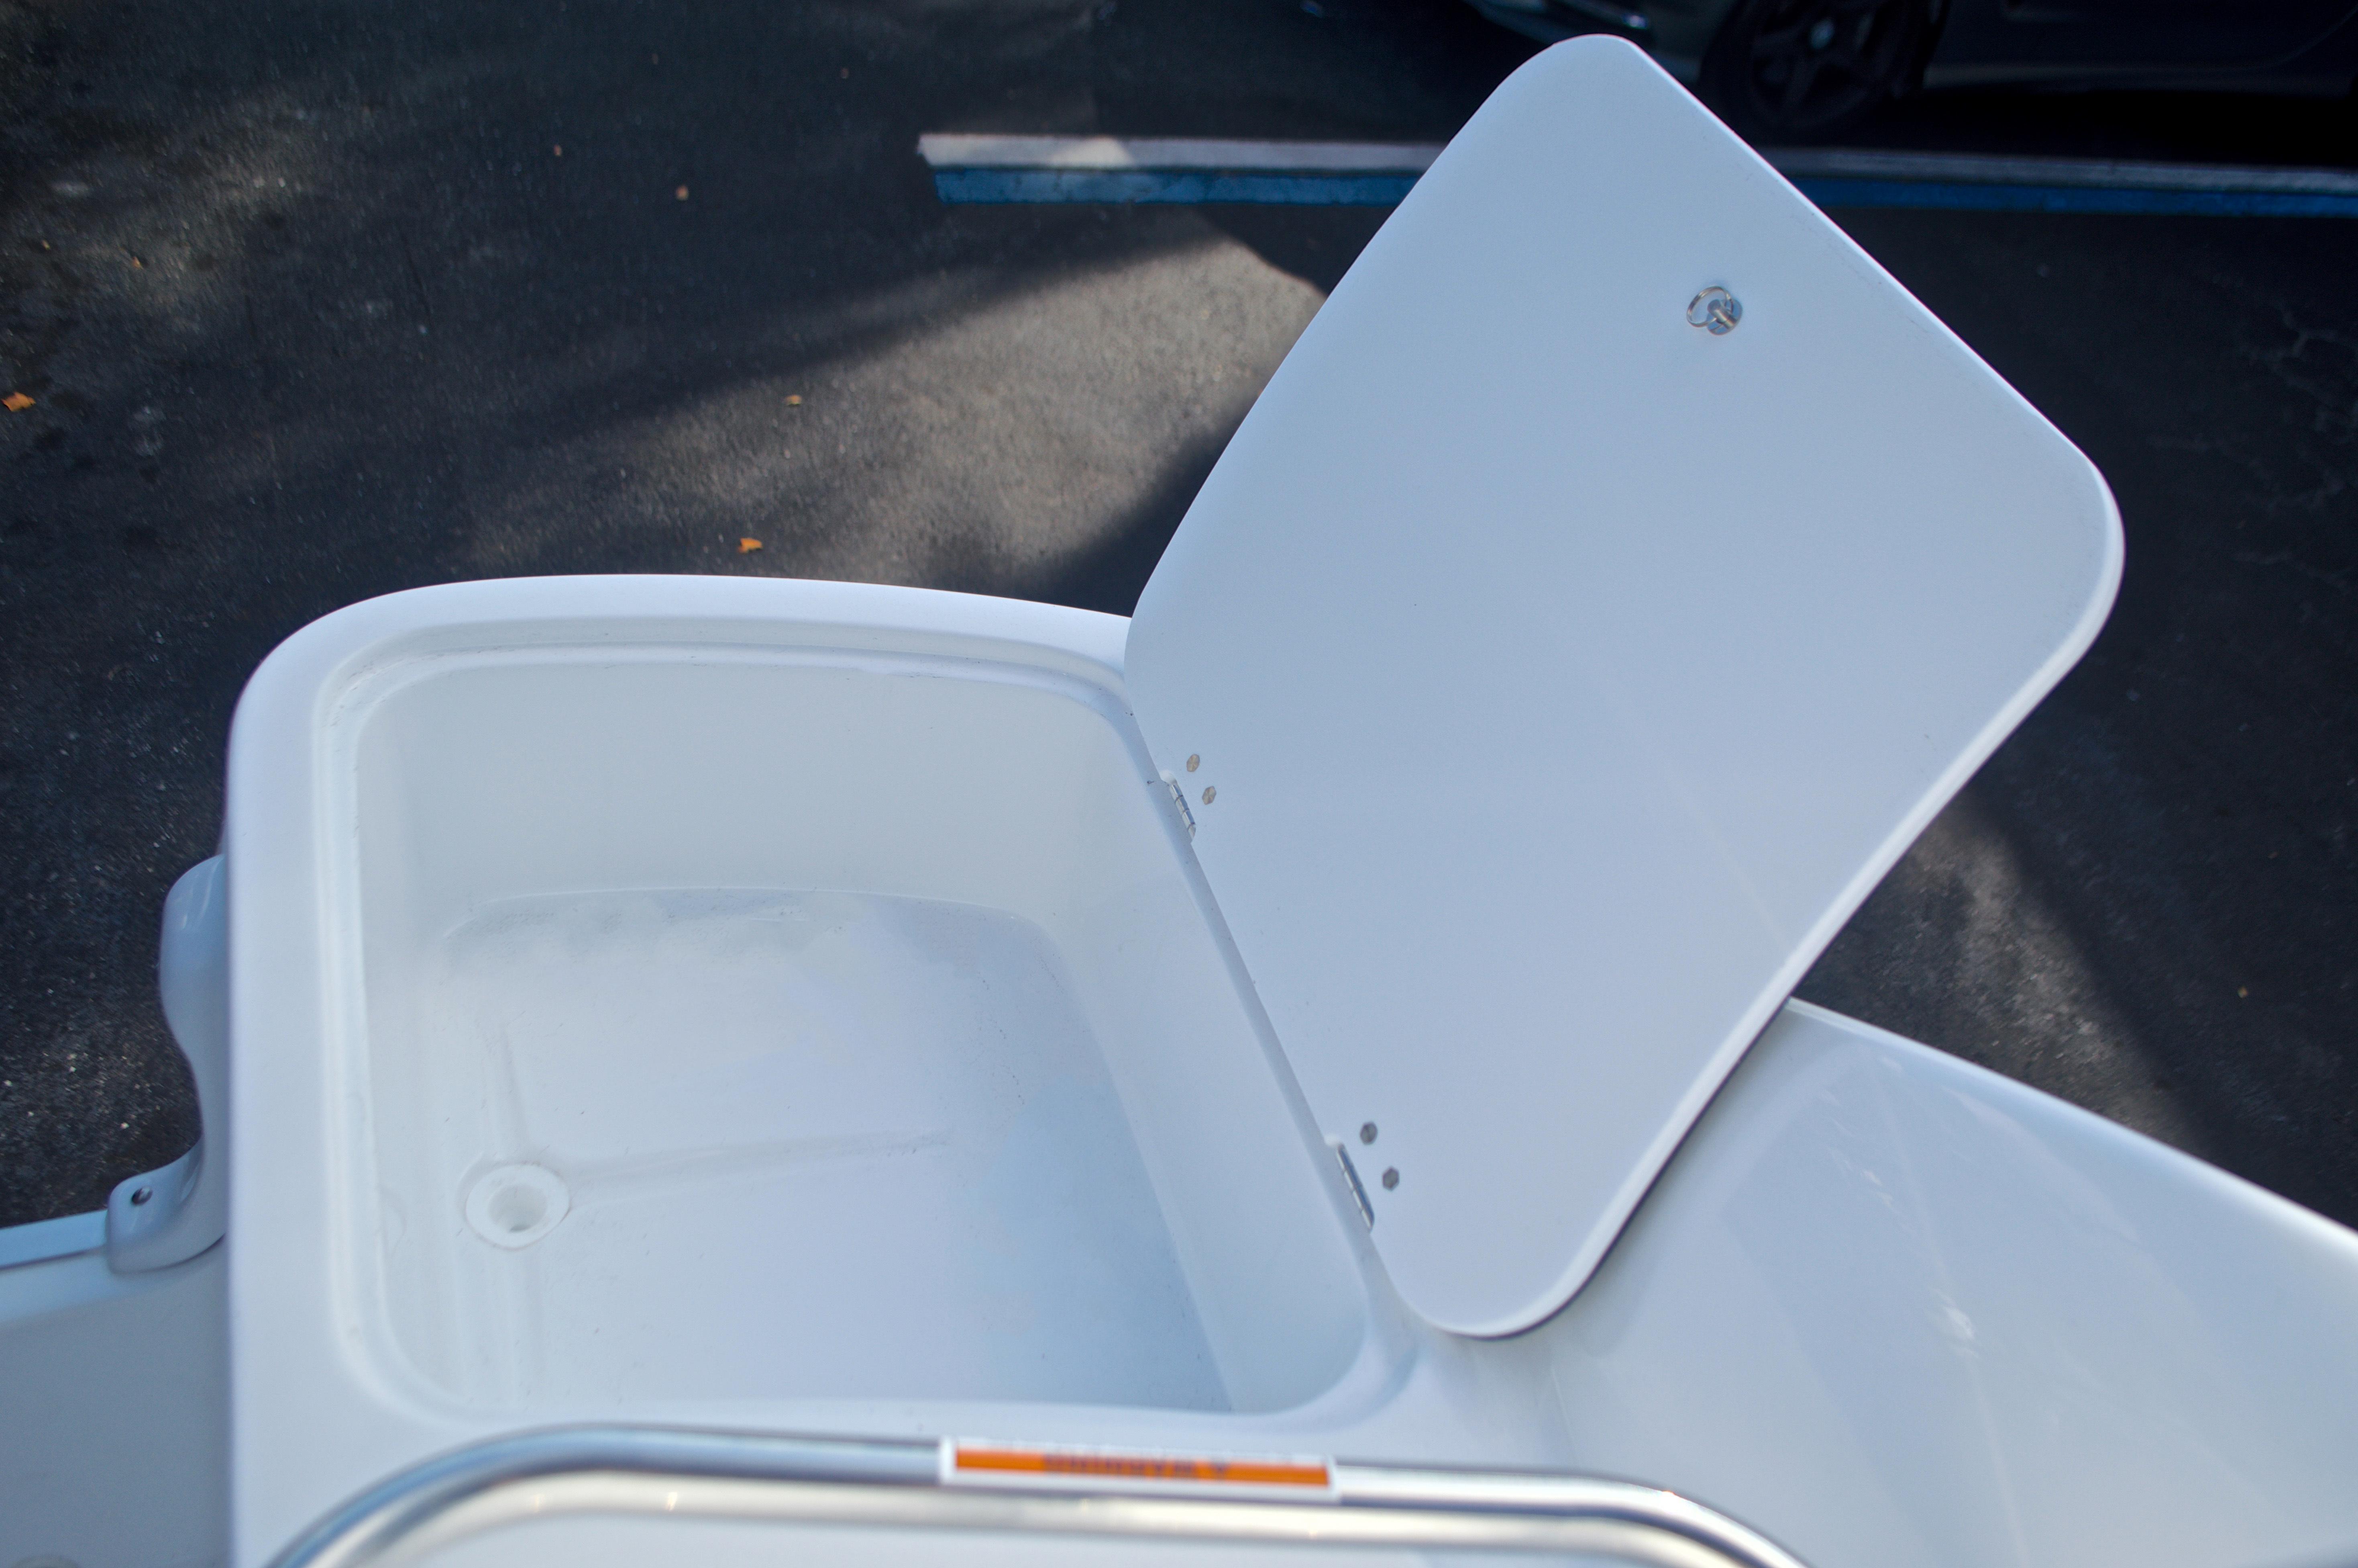 Thumbnail 20 for New 2017 Hurricane SunDeck SD 2400 OB boat for sale in Miami, FL